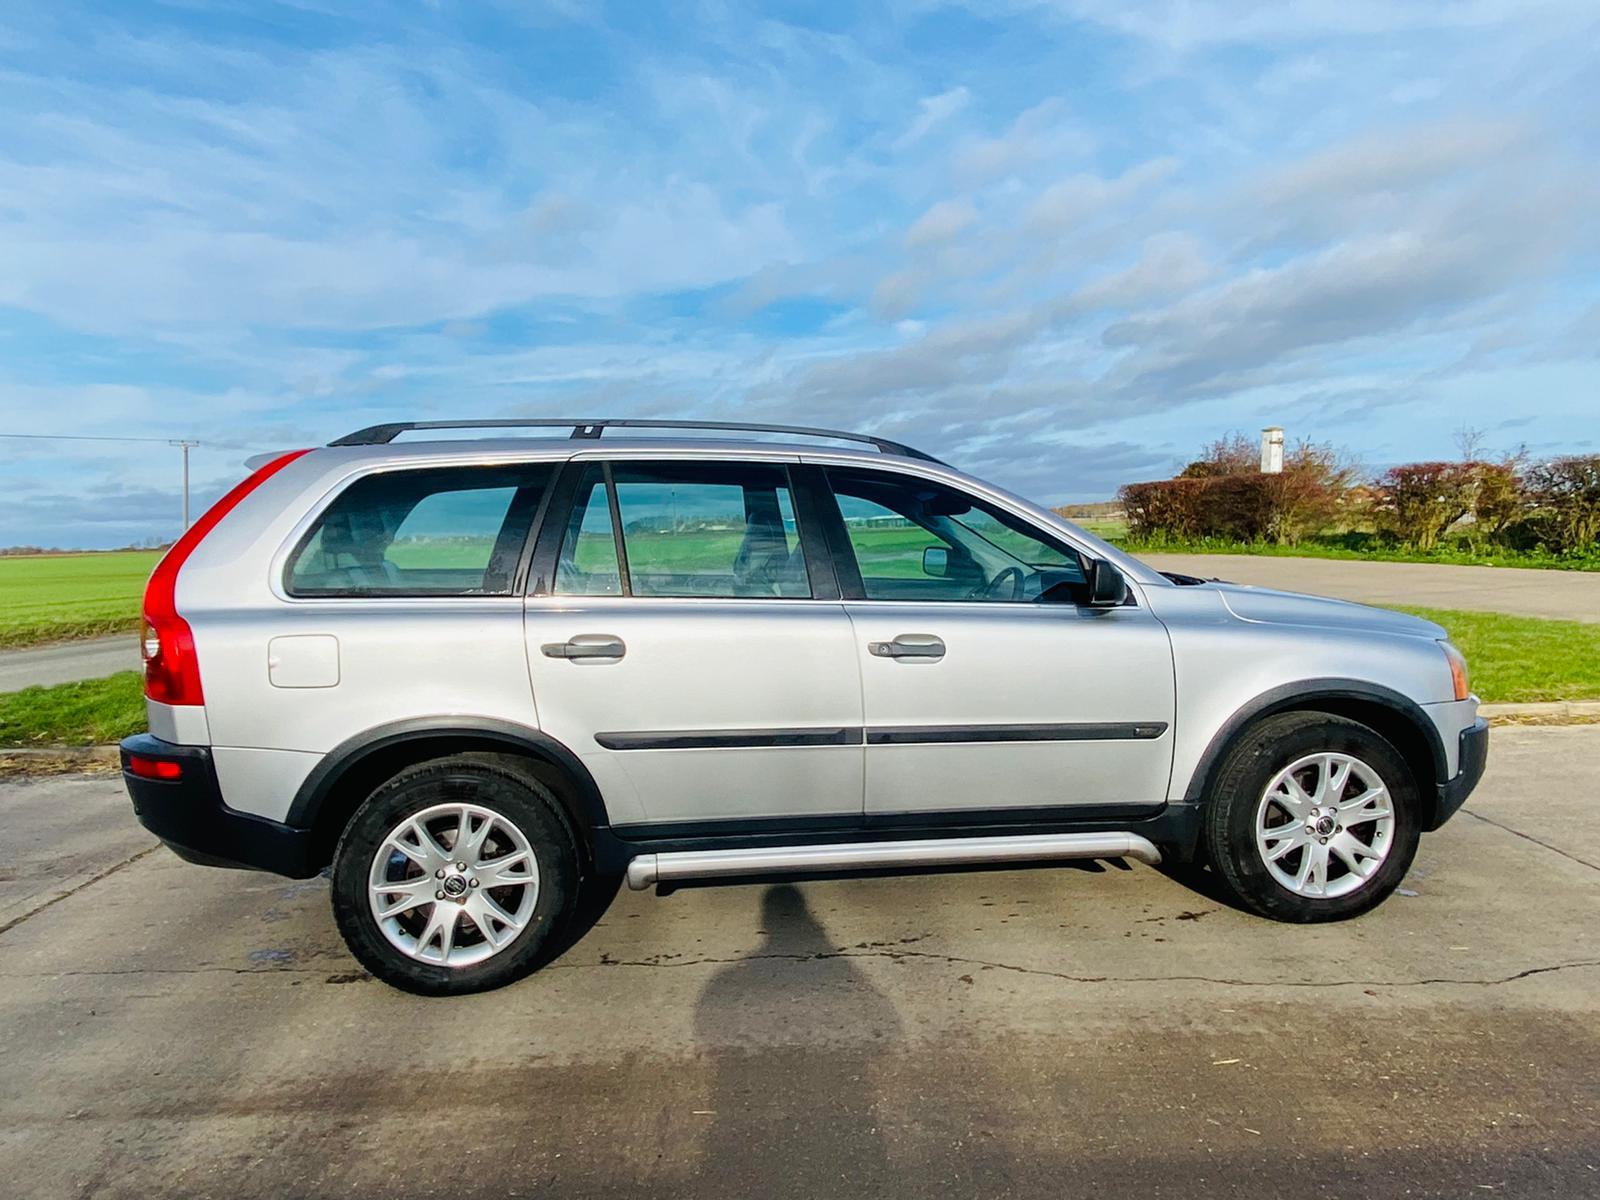 Volvo XC90 2.4 D5 185bhp SE Geartronic Auto 2006 06 Reg - 7 Seats - Air con - Top Spec - Image 7 of 47